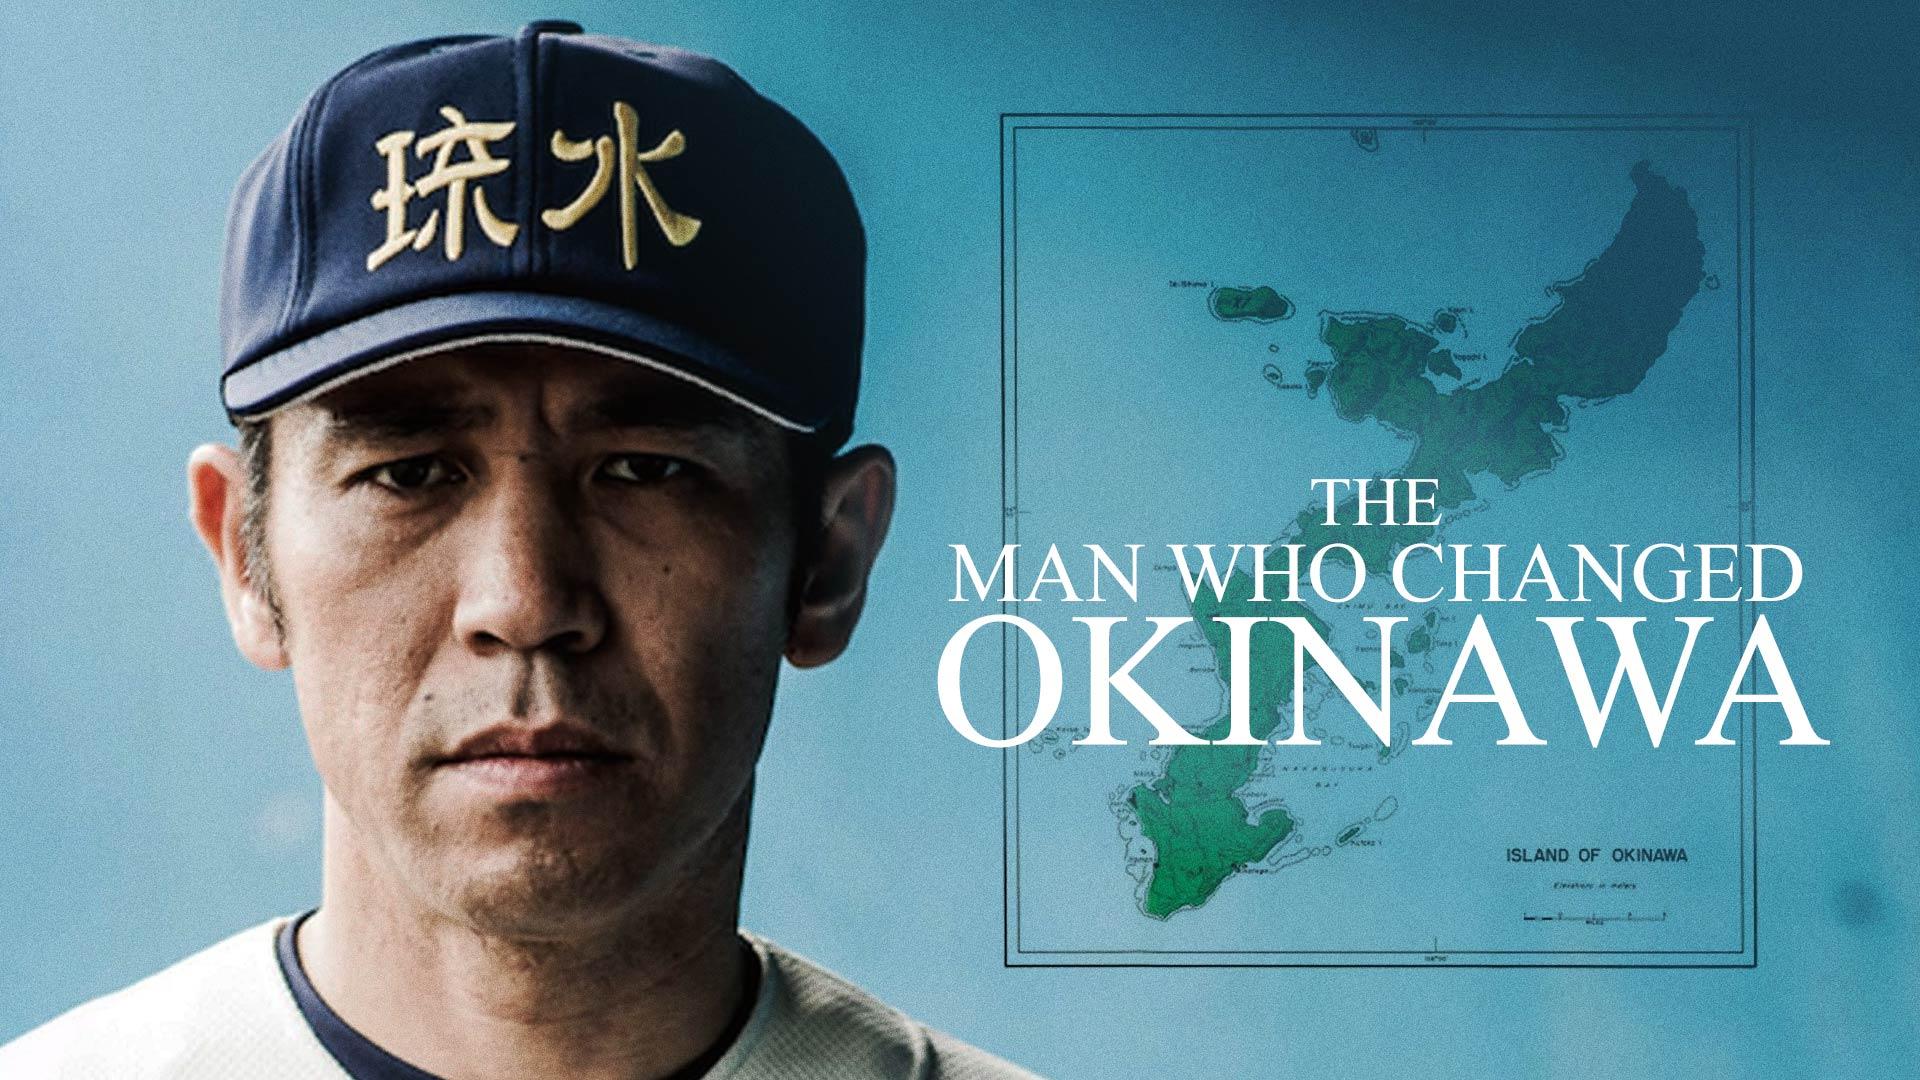 The Man Who Changed Okinawa